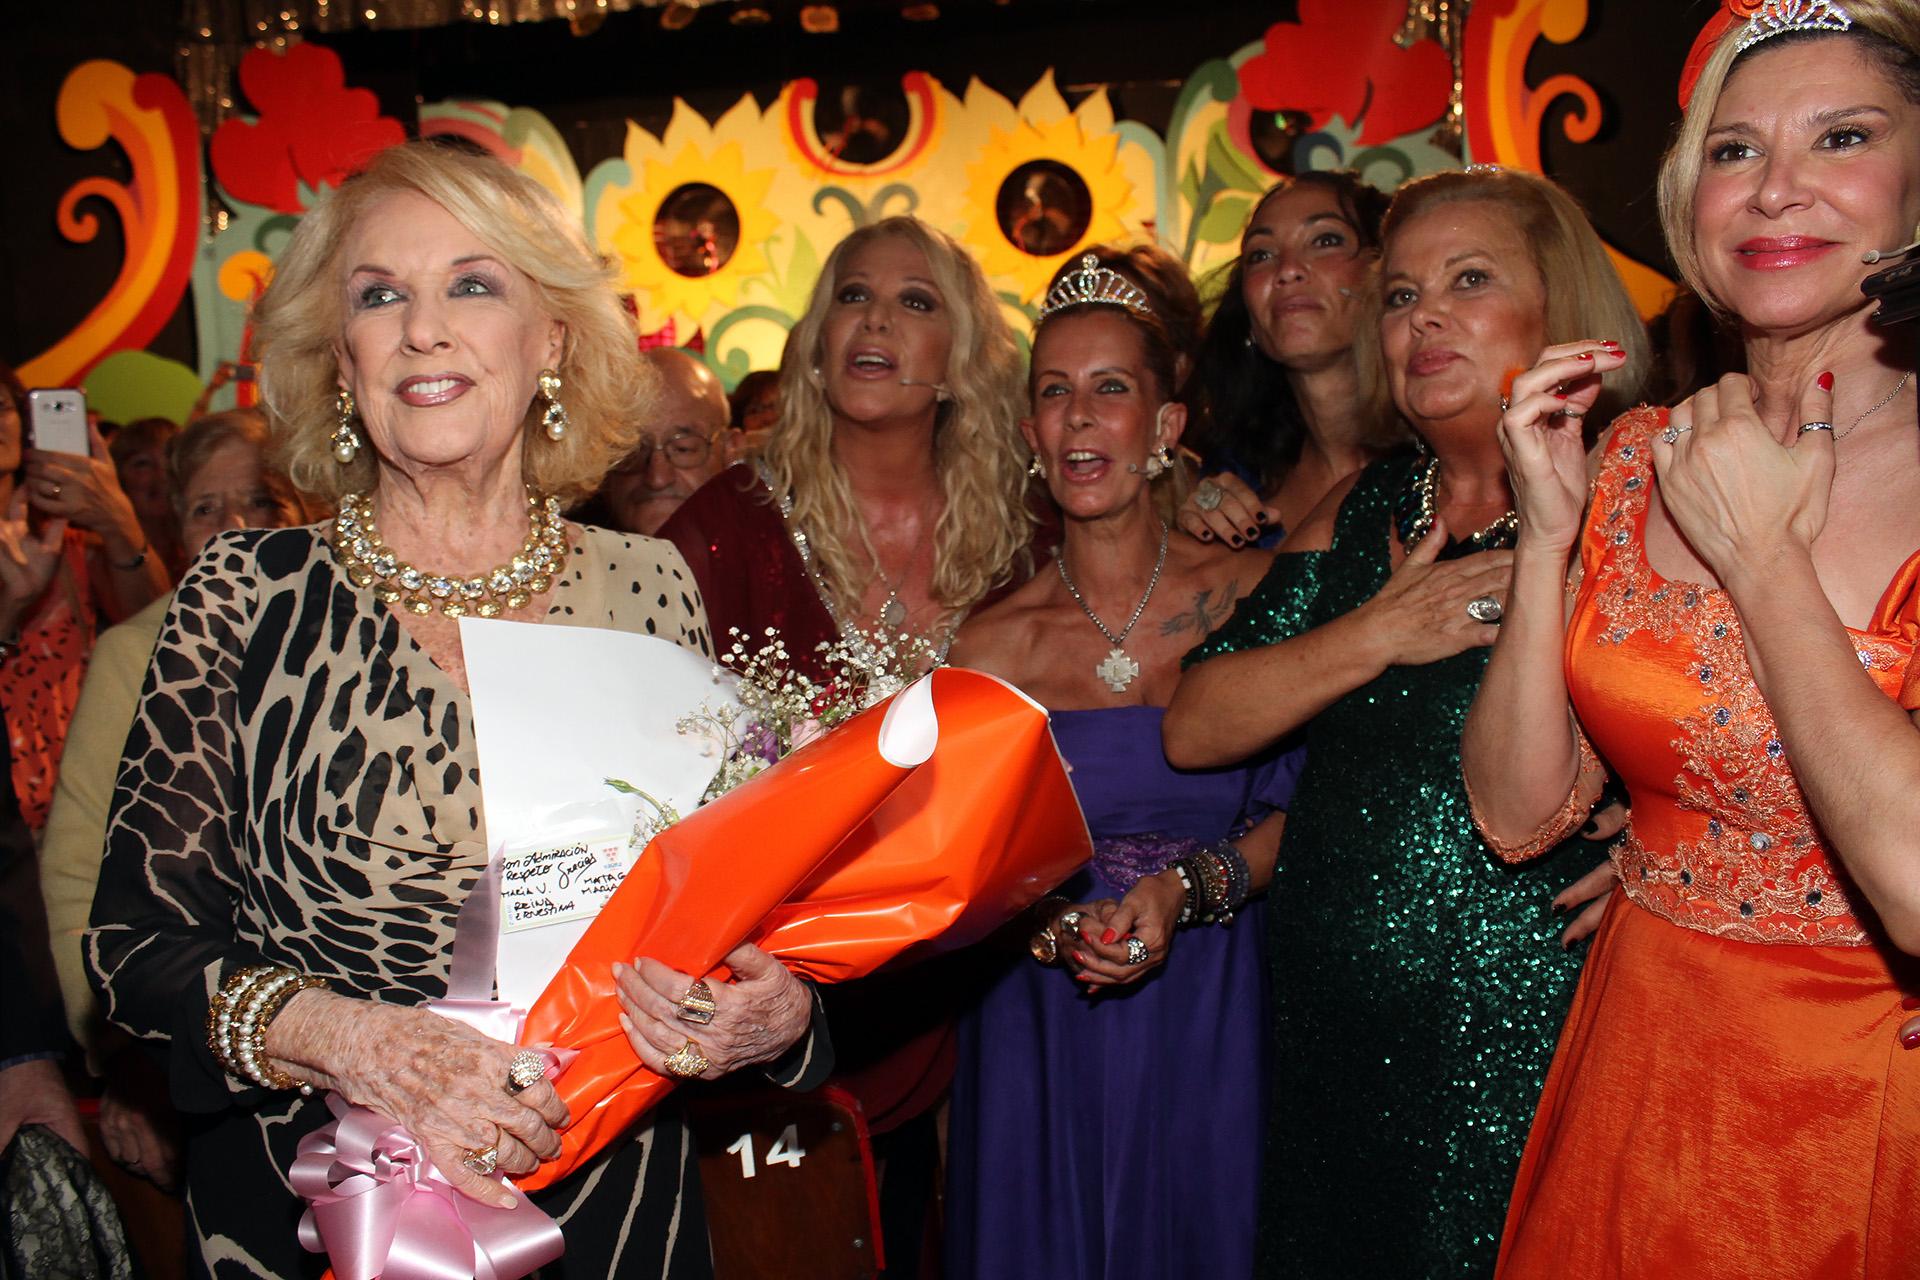 "Mirtha Legrand fue a ver ""El show de la menopausia"", protagonizada por MaríaValenzuela, Marta González, Reina Reech, Ernestina Pais y María Carámbula"